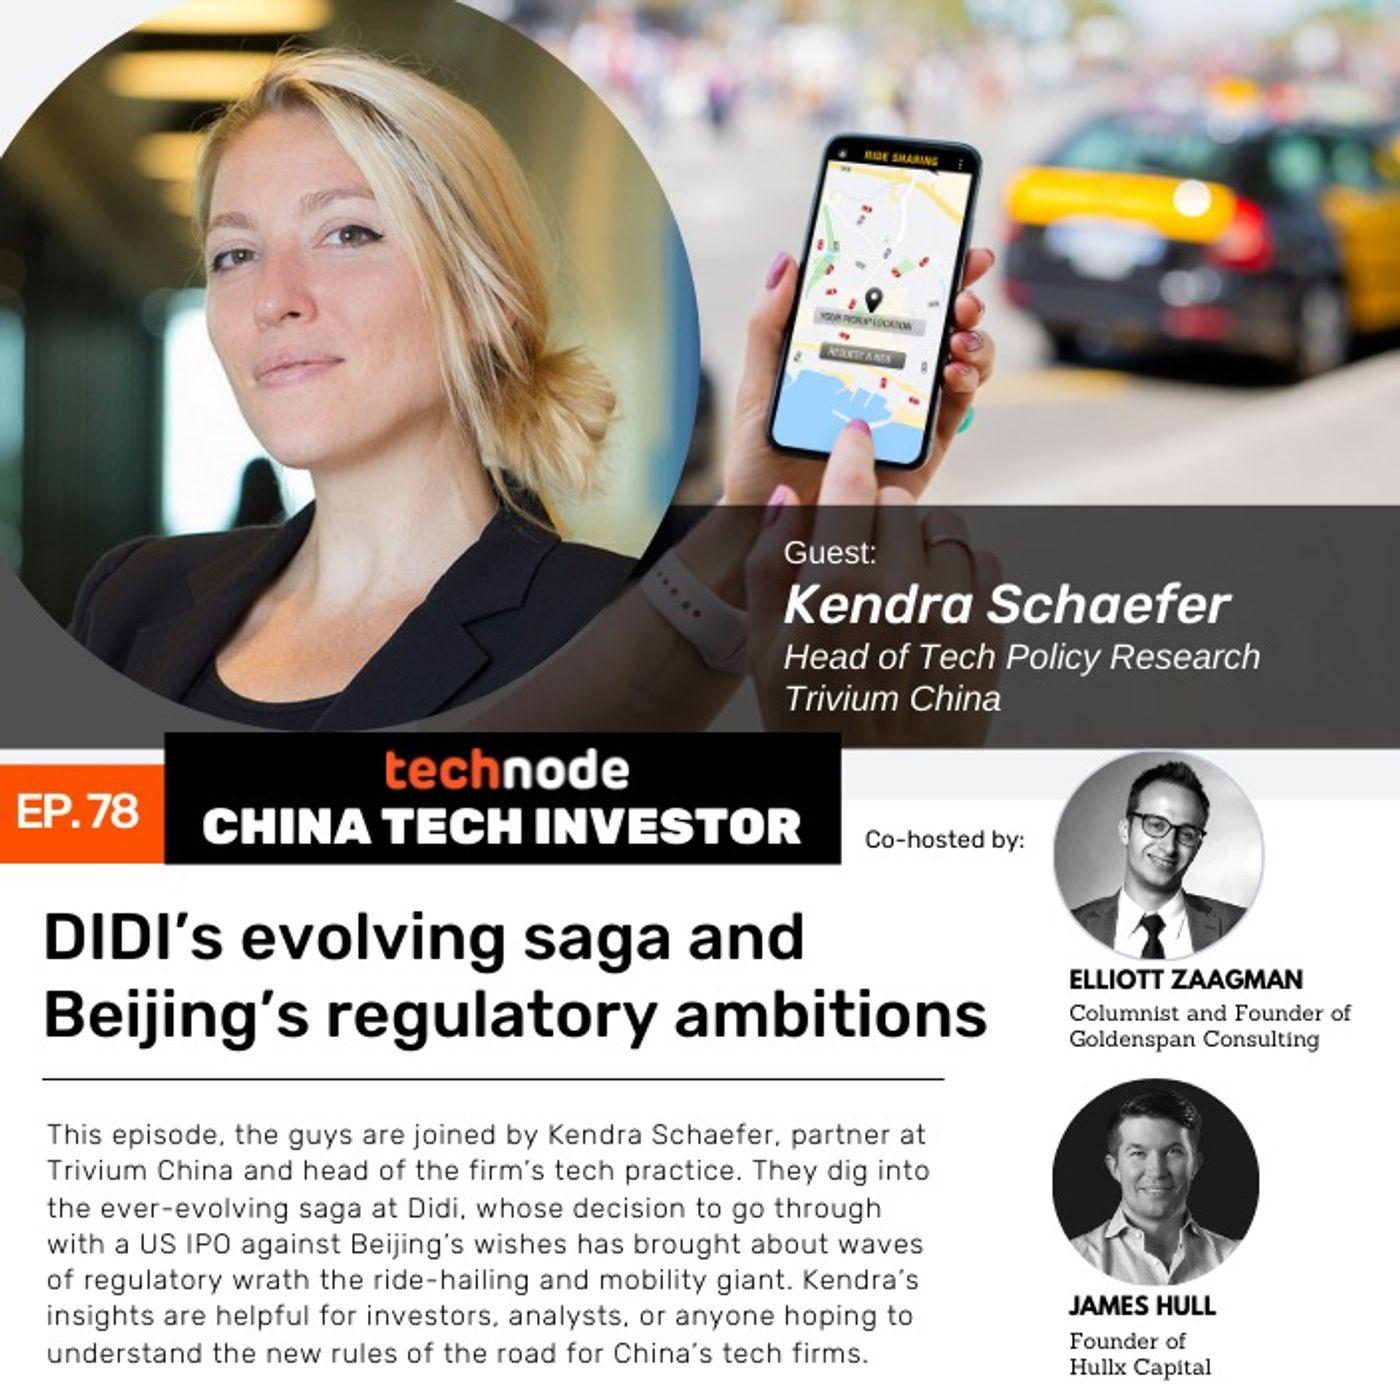 CTI 78: Didi's evolving saga and Beijing's regulatory ambitions, with Kendra Schaefer